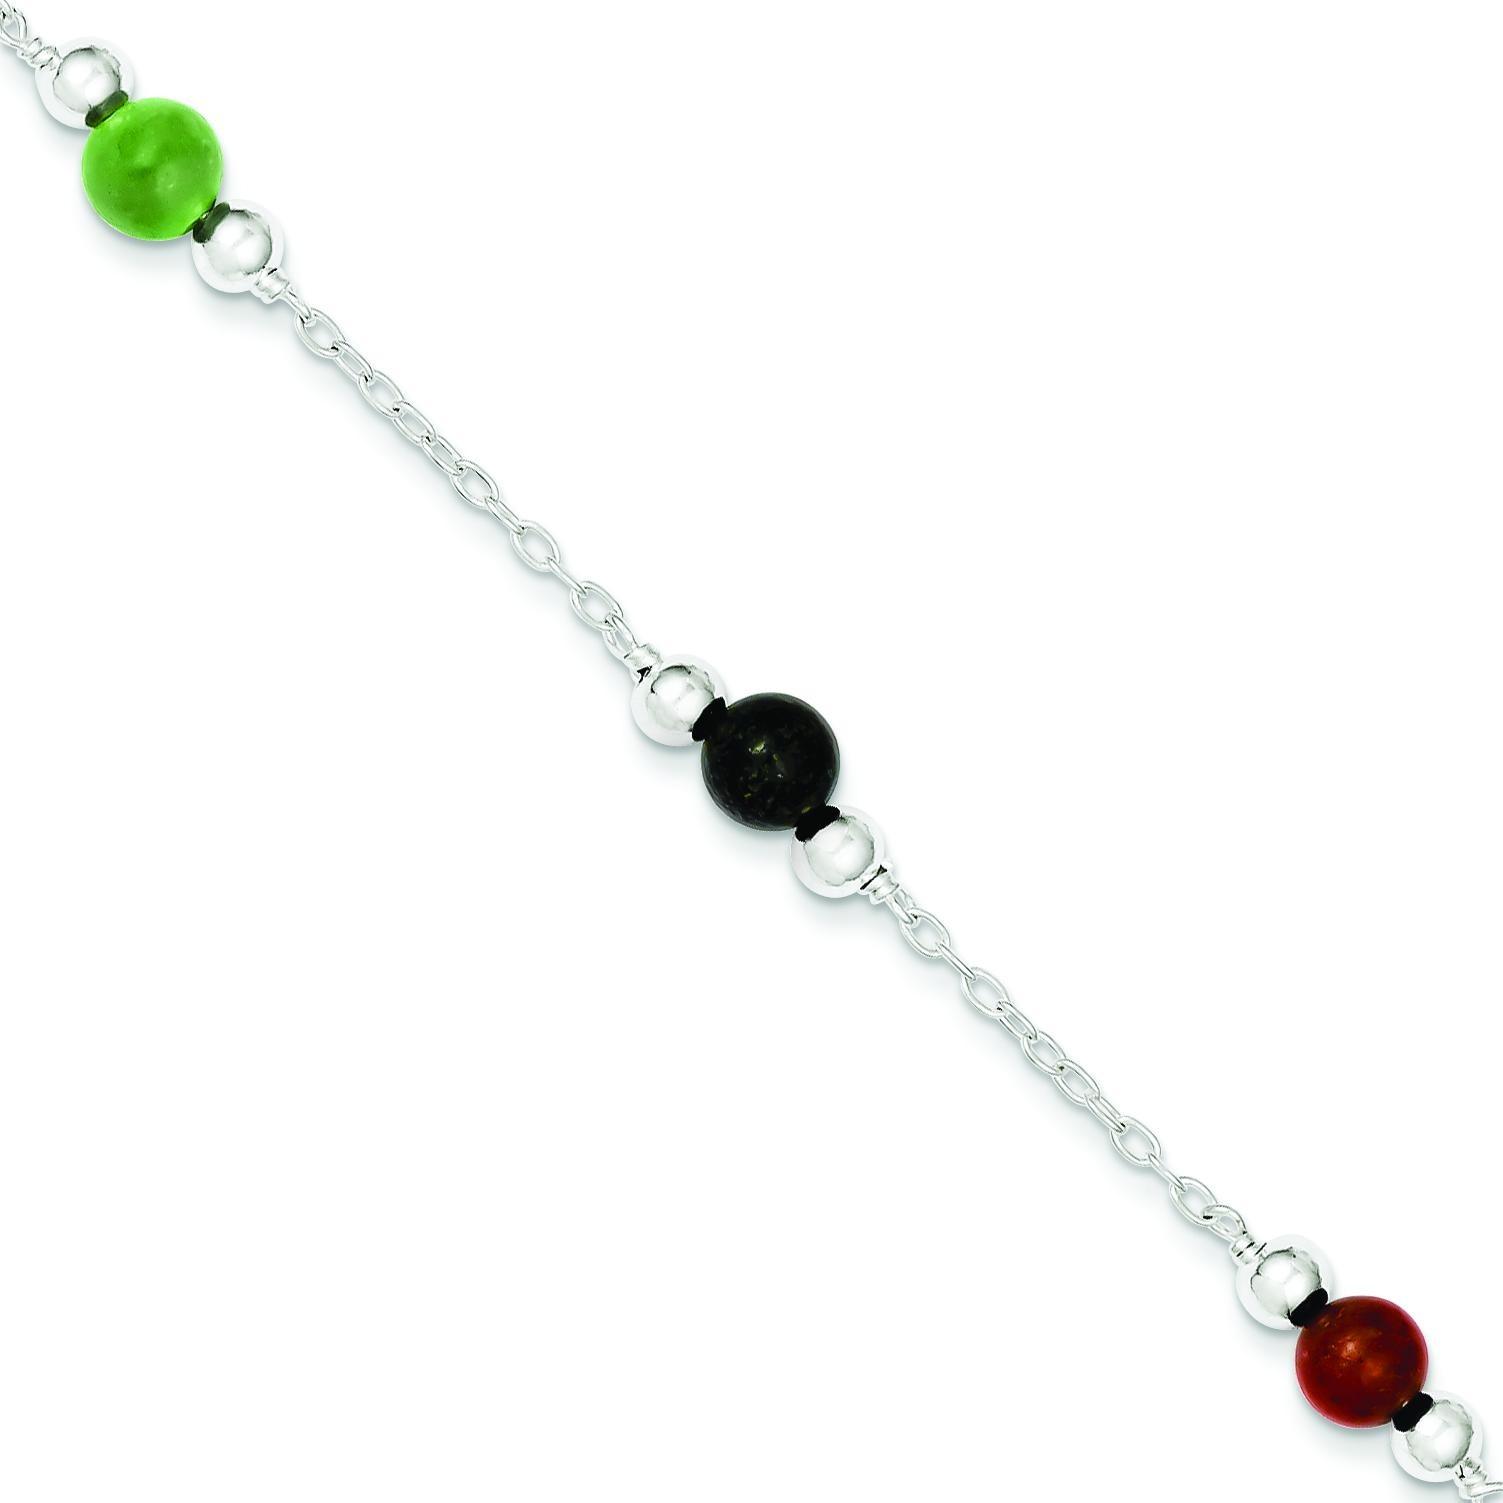 Multi-Color Jade Anklet in Sterling Silver